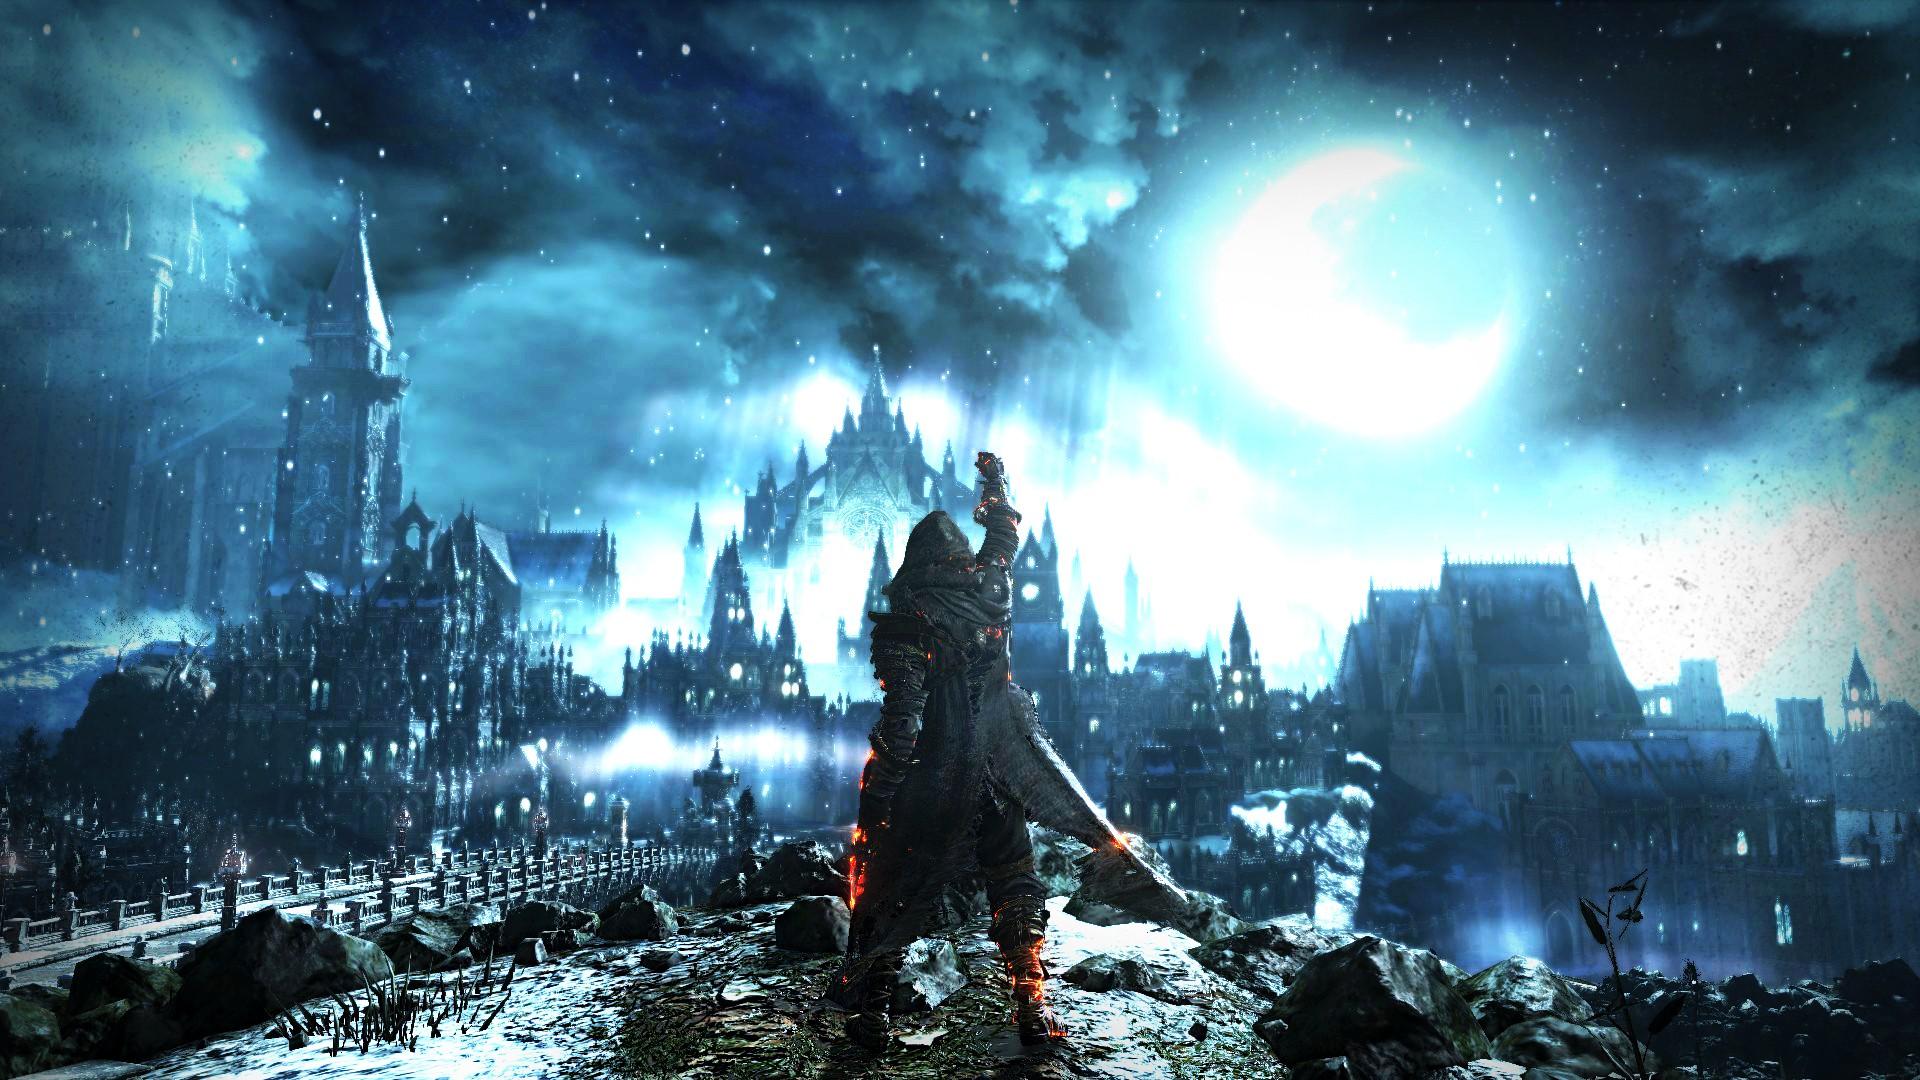 Dark Souls Background 1920x1080: Dark Souls III HD Wallpaper